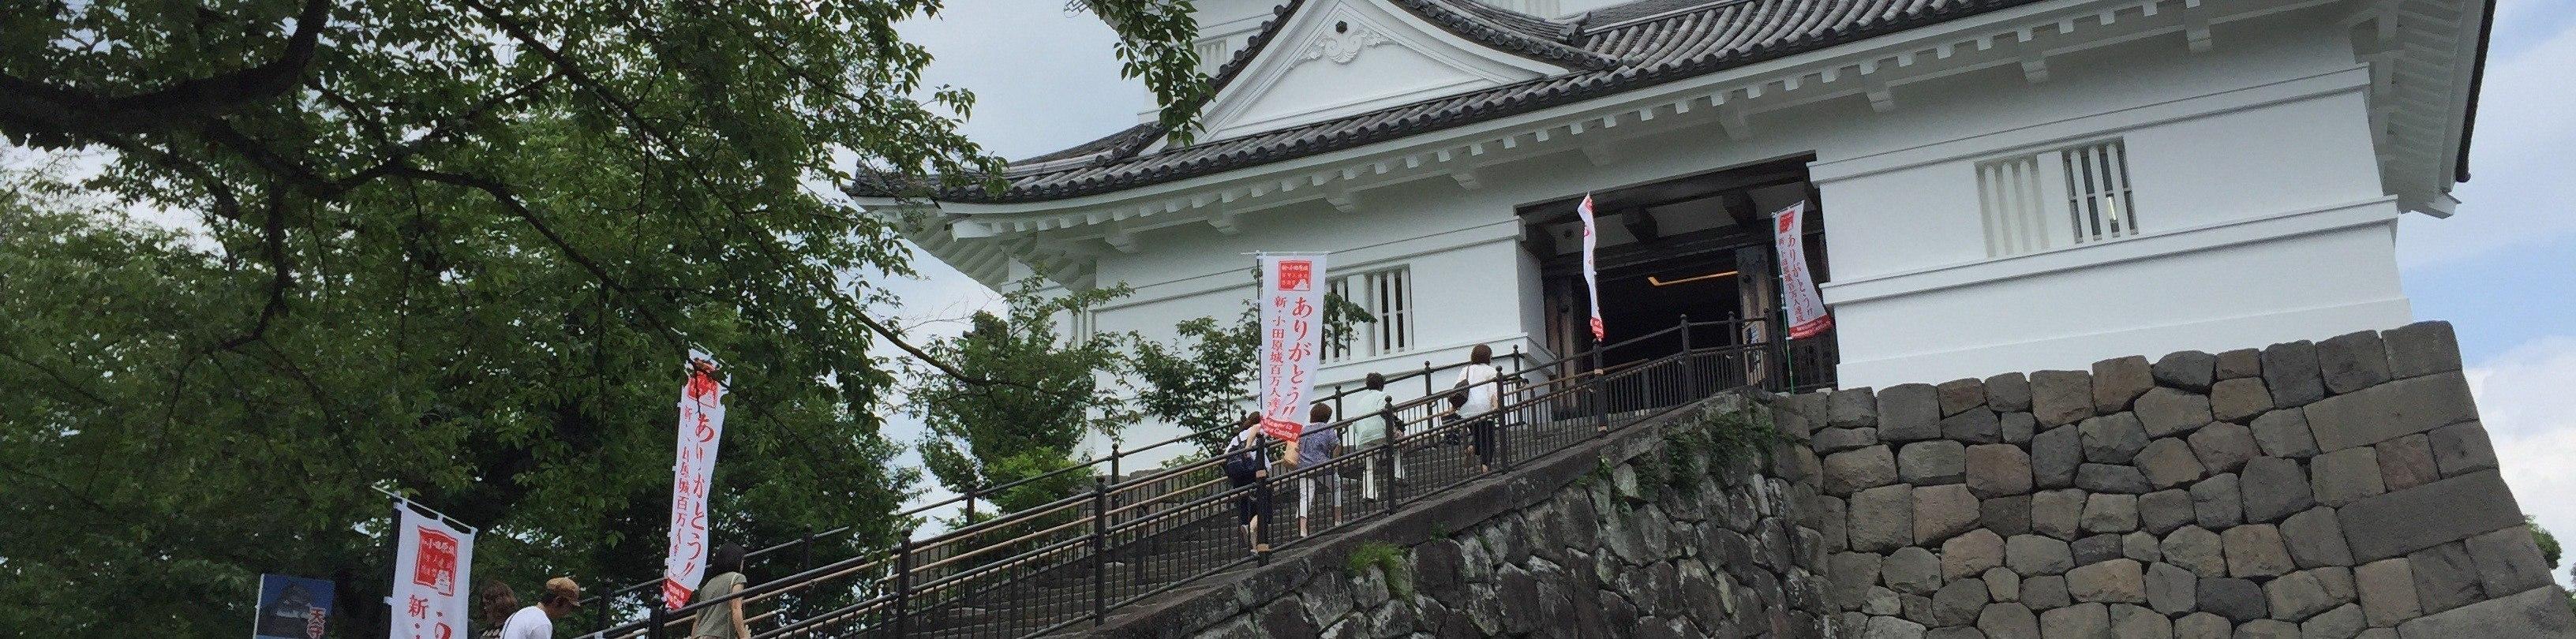 Odawara Castle Kyoto Kanagawa Japan - Planning A Trip To Japan Blog Travel Destinations Review Video 2017 ⚡🔥💥 - Odawara Castle Kyoto Kanagawa Japan